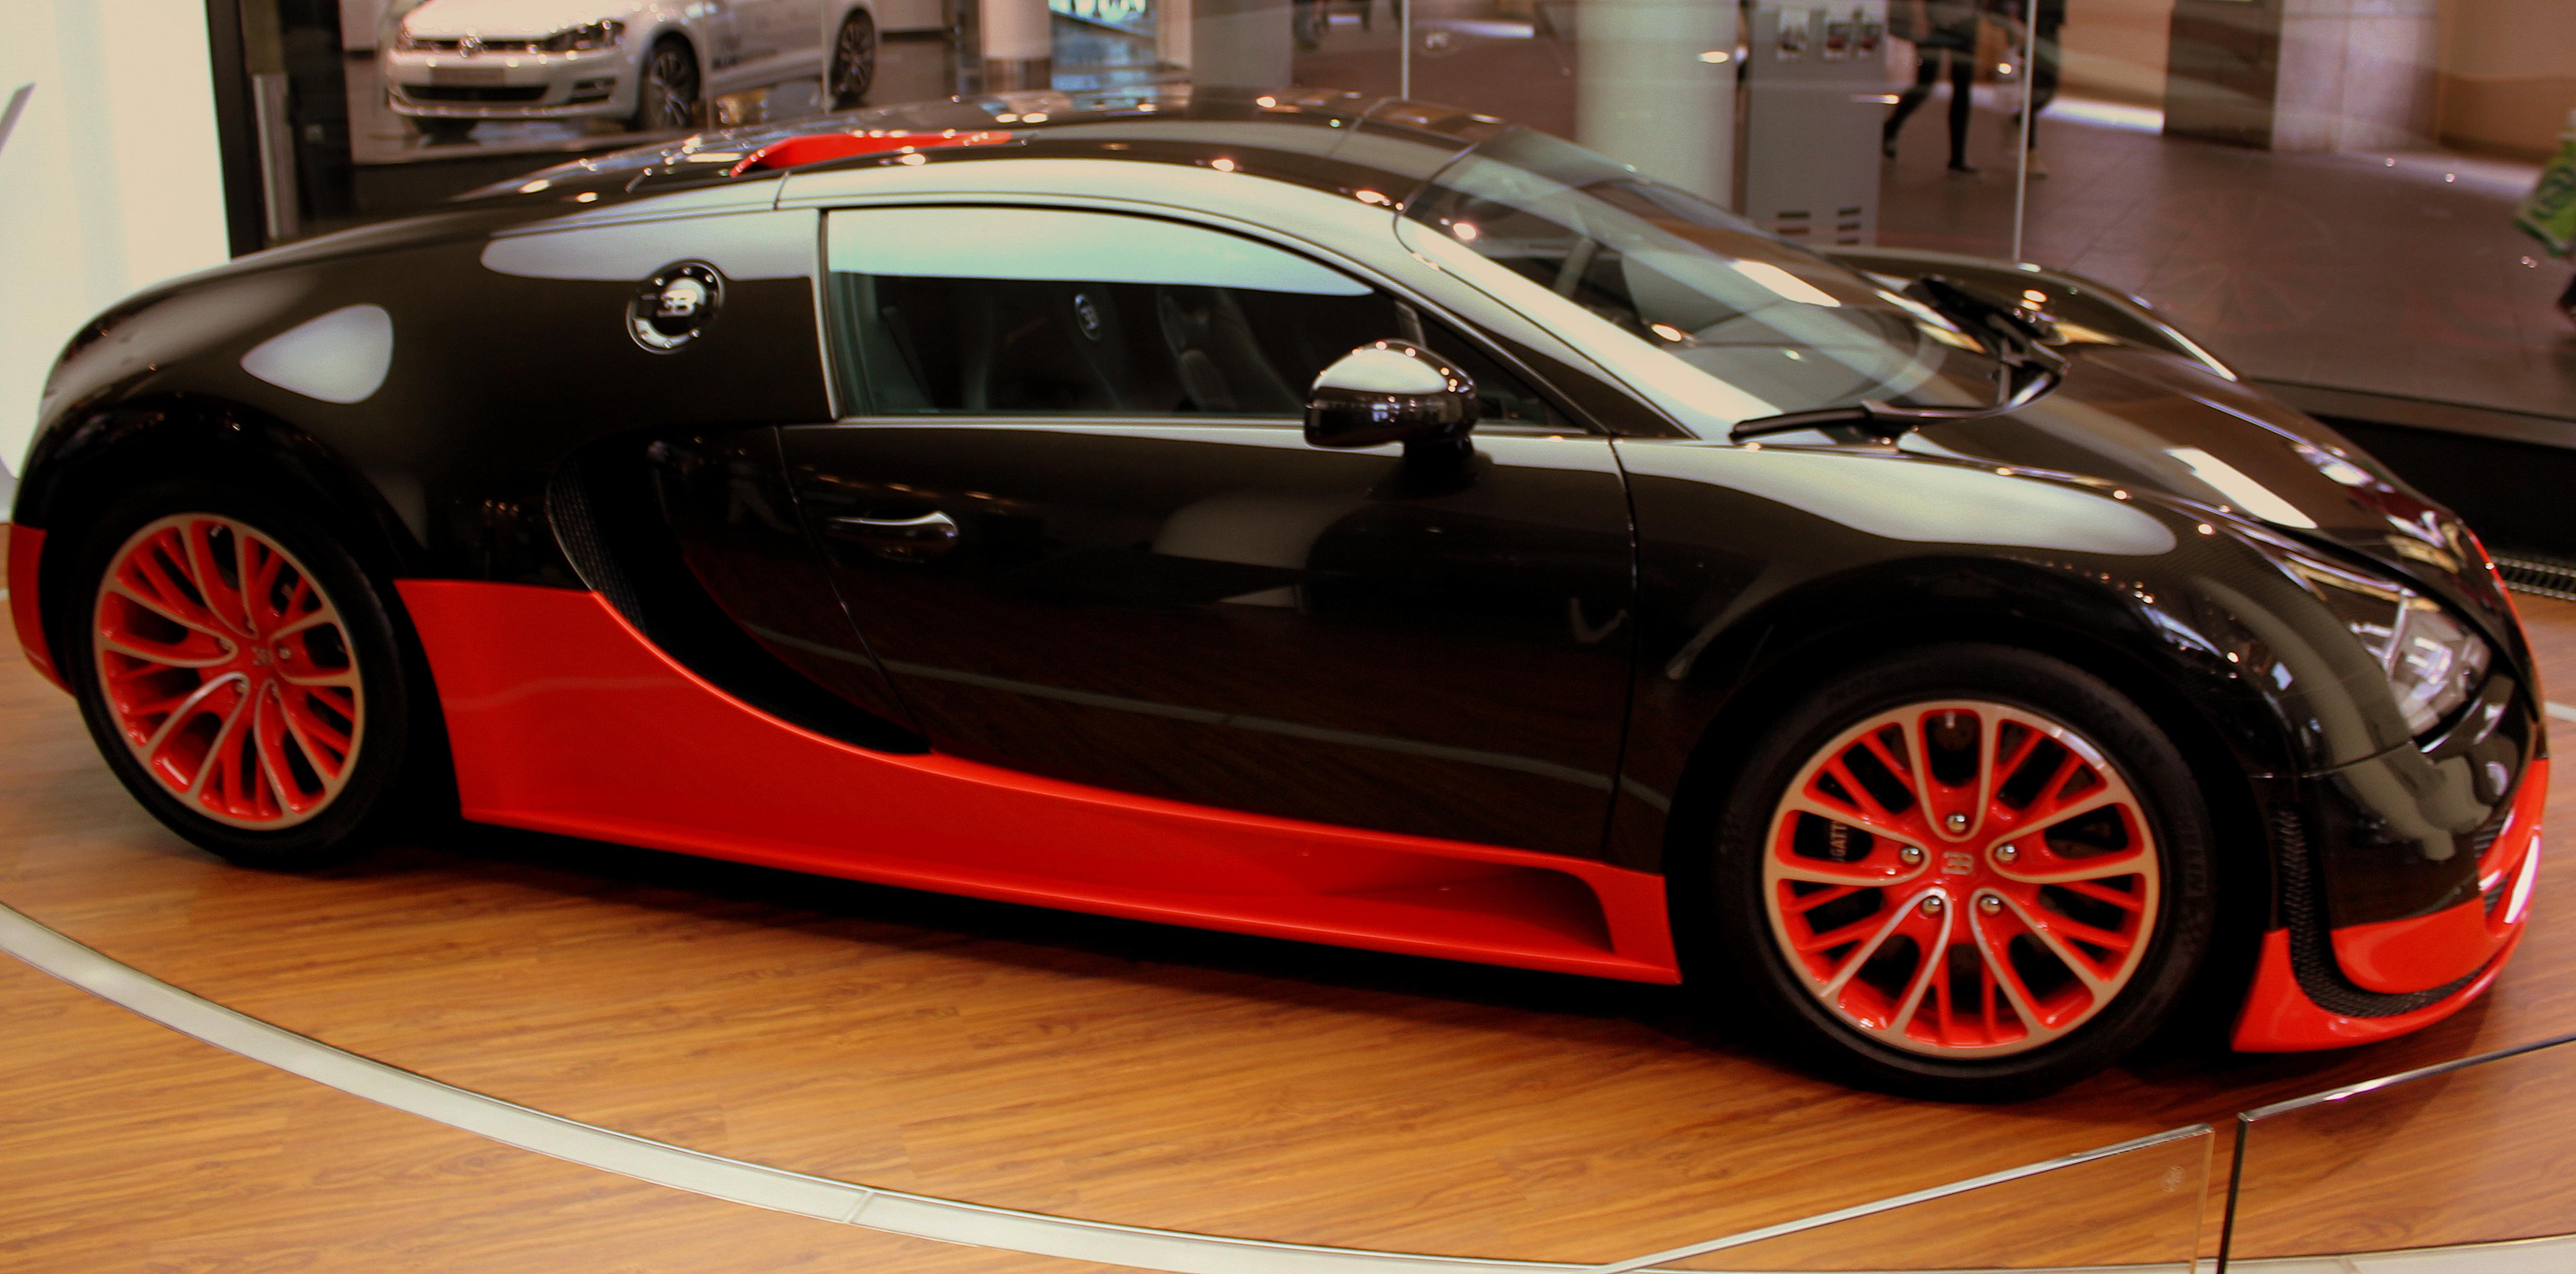 file bugatti veyron 16 4 super sport in bugatti dealer in berlin. Cars Review. Best American Auto & Cars Review